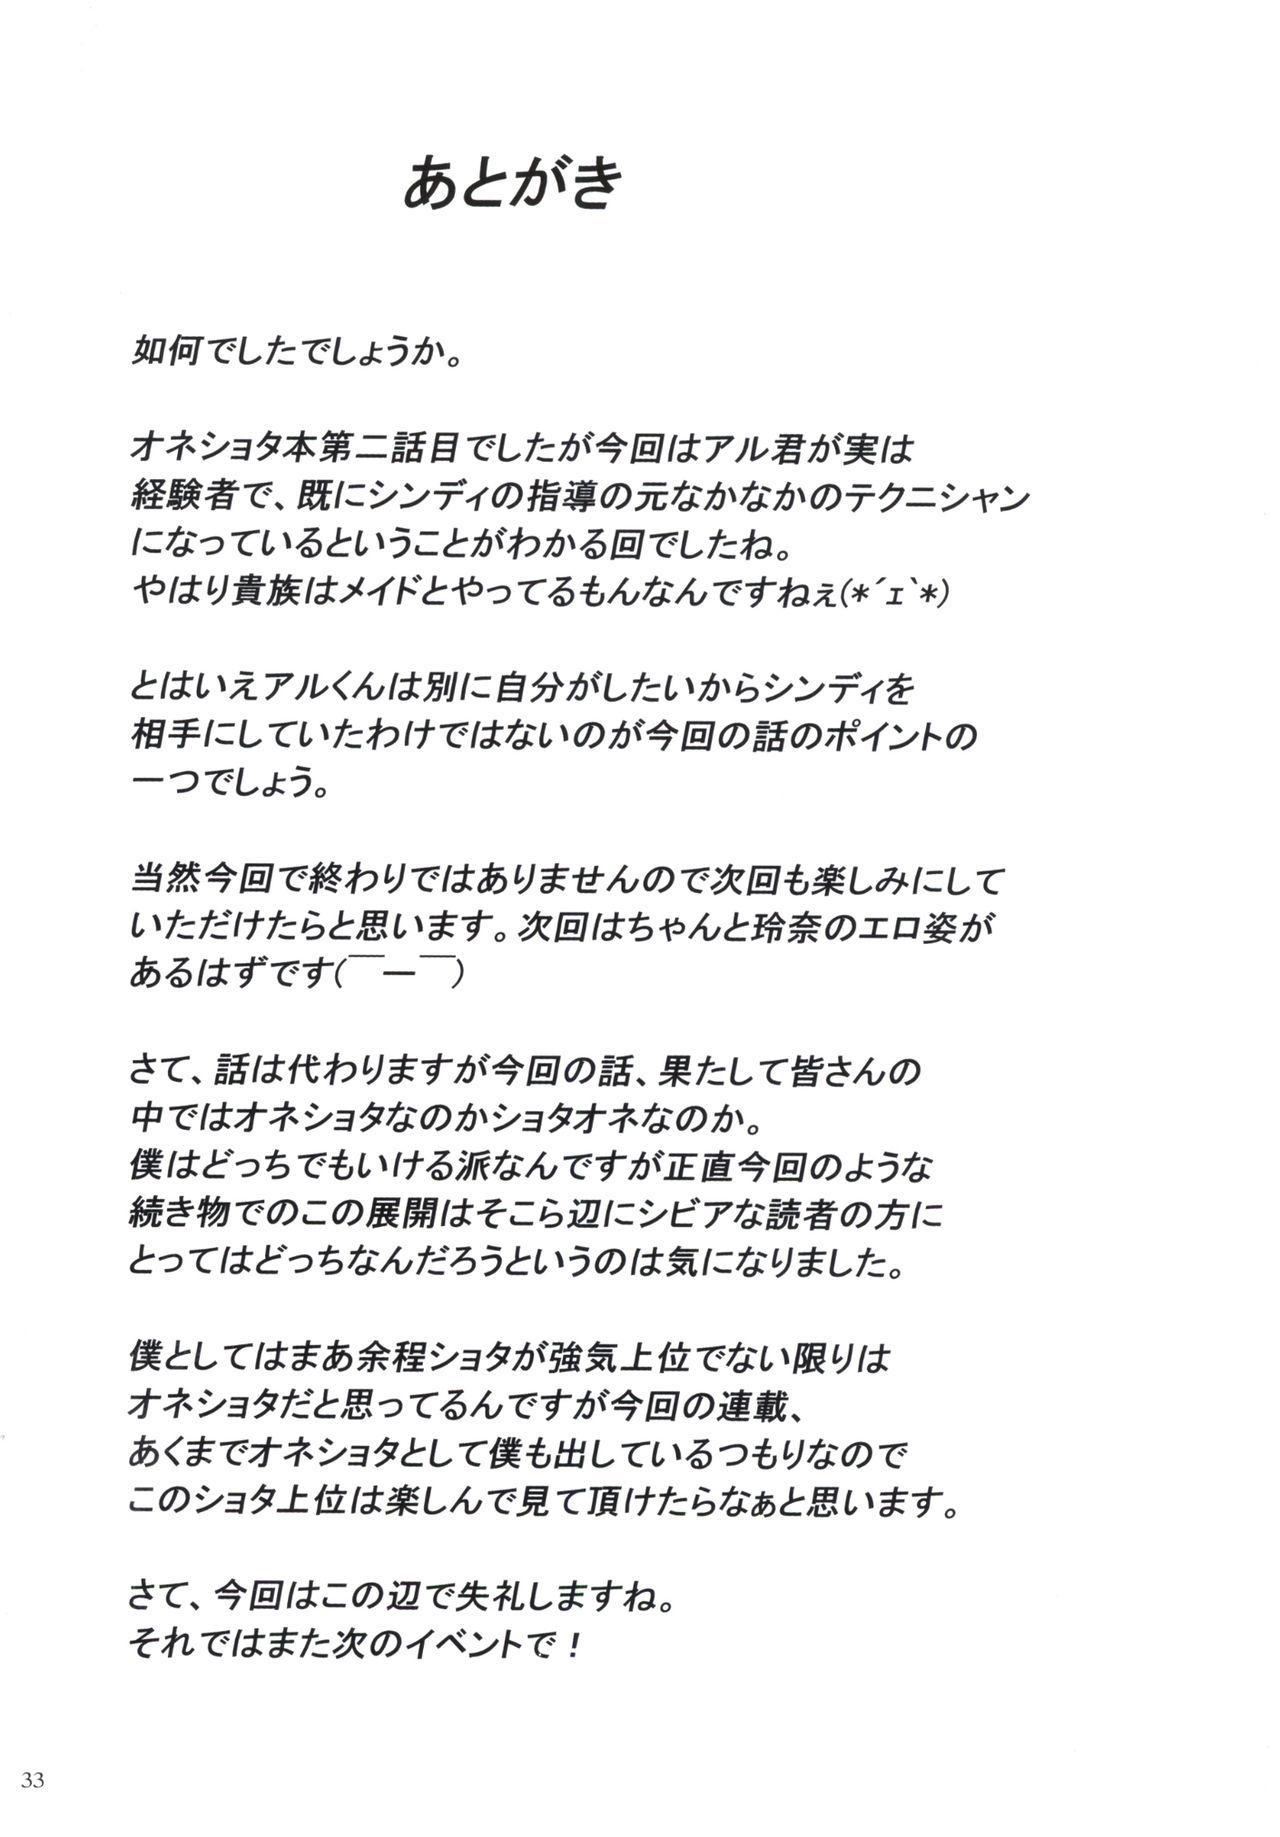 Gal Shota Cinderella 2 31